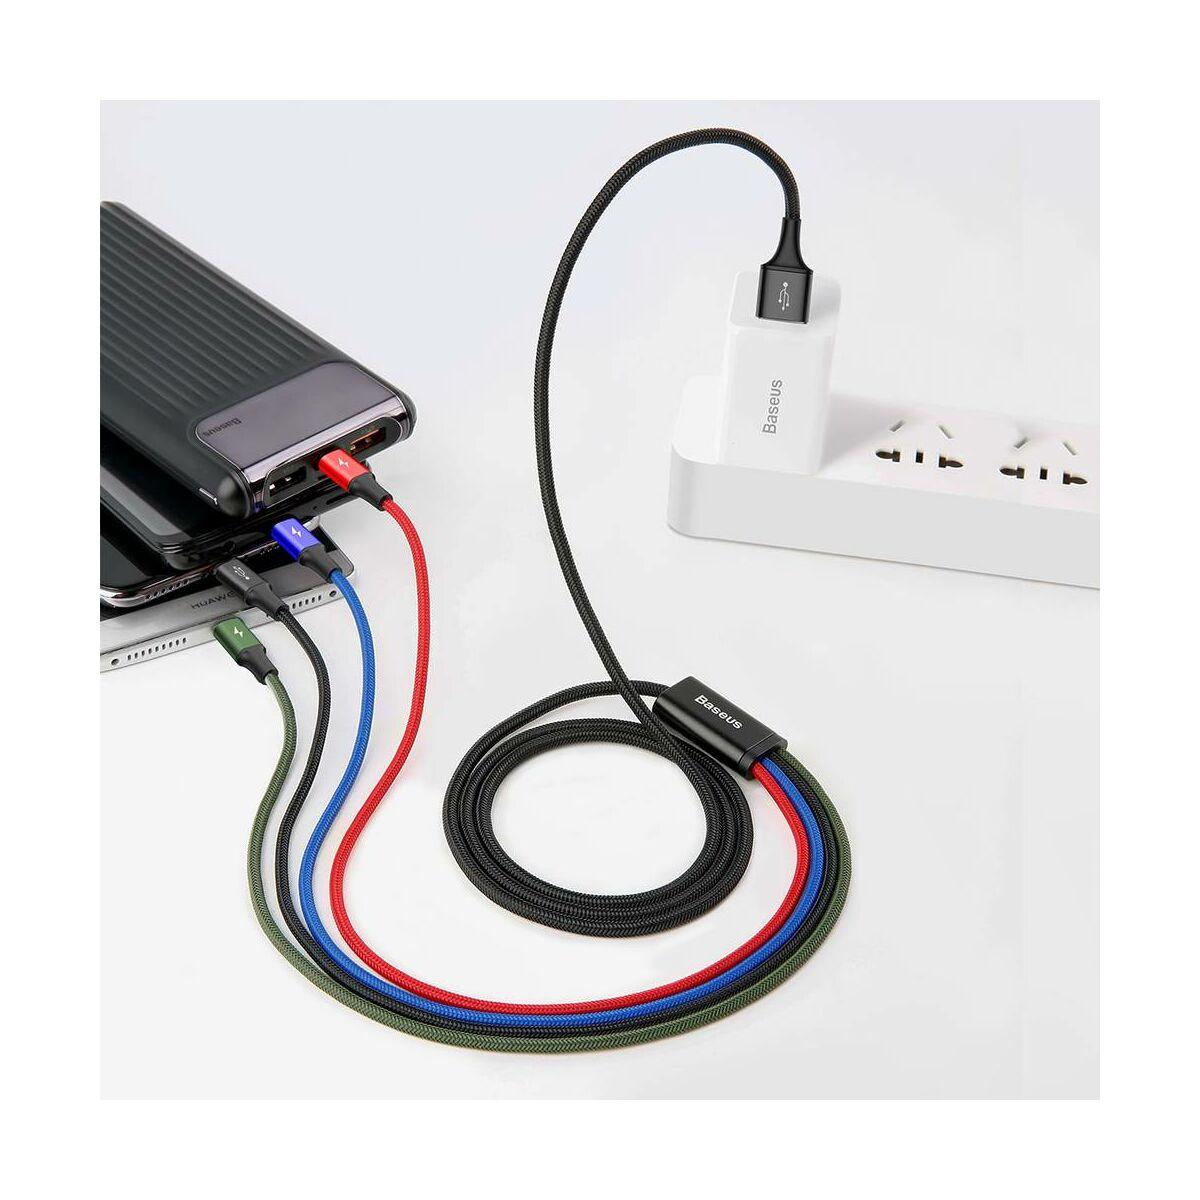 Baseus Univerzális kábel, Fast, 4-in-1 multifunkciós(Fast Lightning + 2 x Type-C + micro USB), 3.5A, 1.2m, fekete (CA1T4-B01)